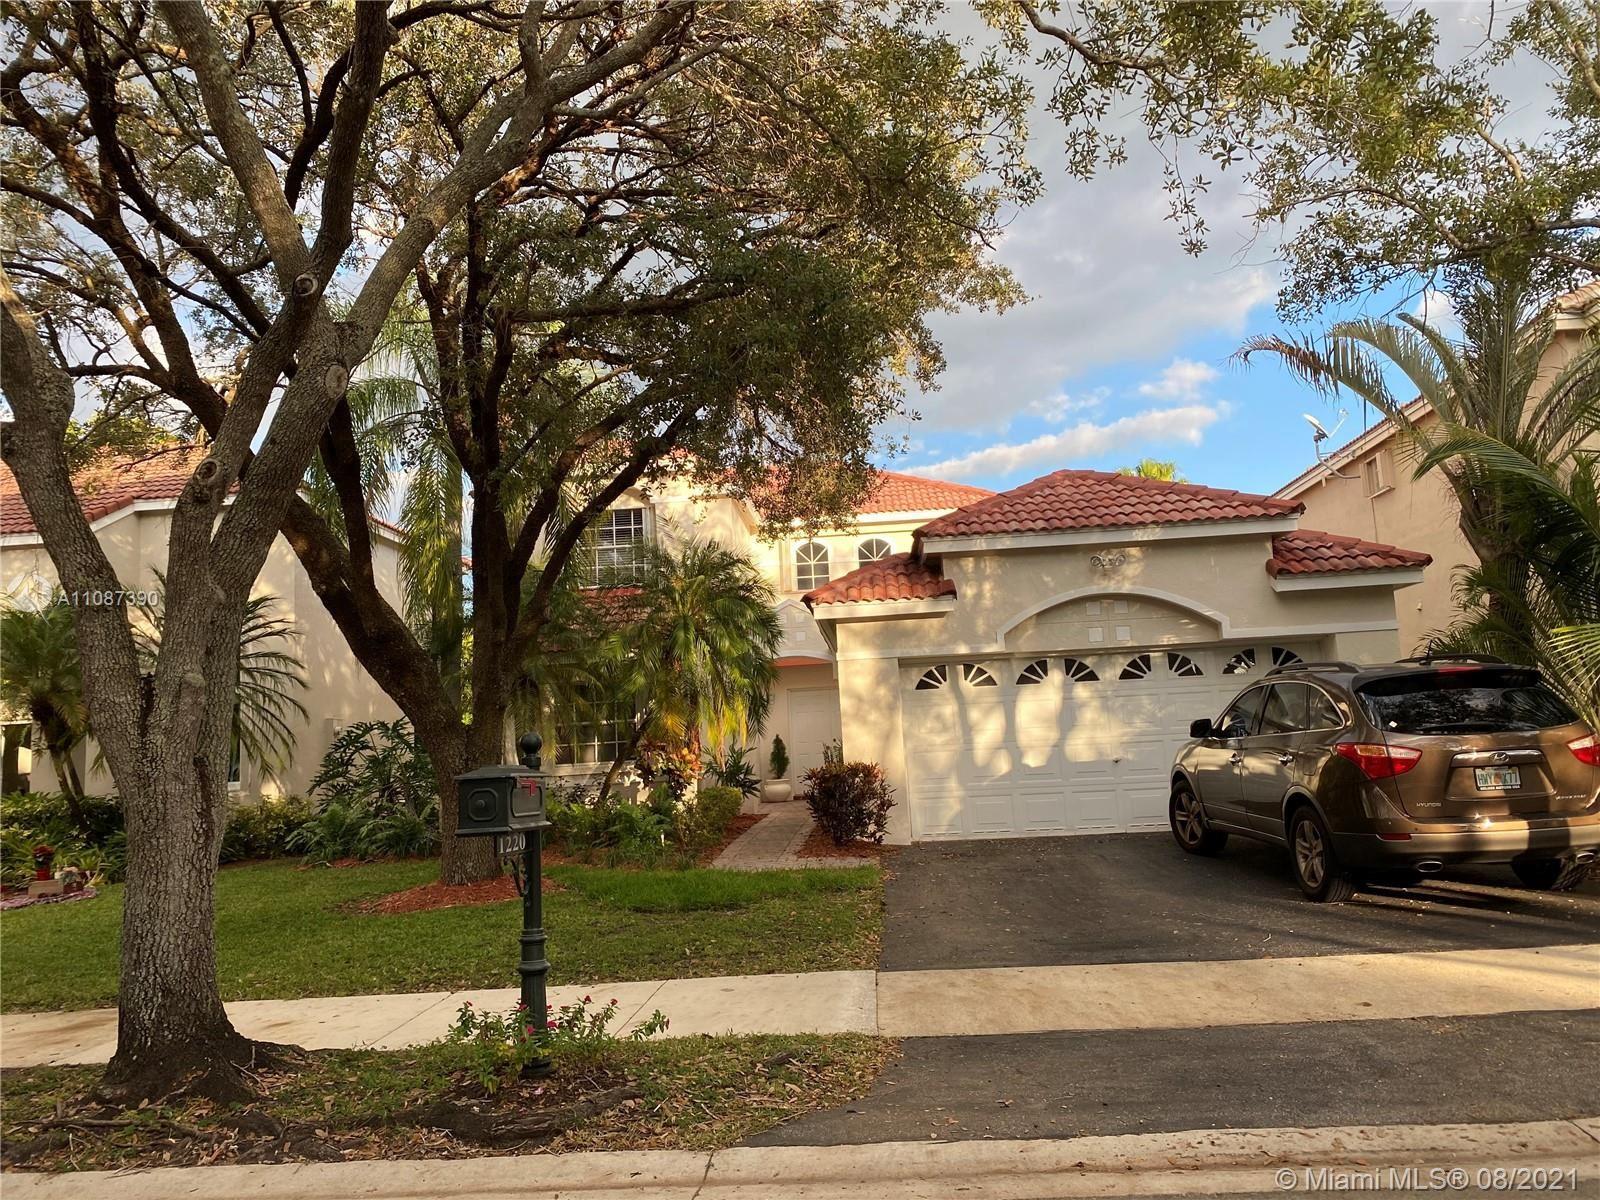 1220 Bayview Cir, Weston, FL 33326 - #: A11087390